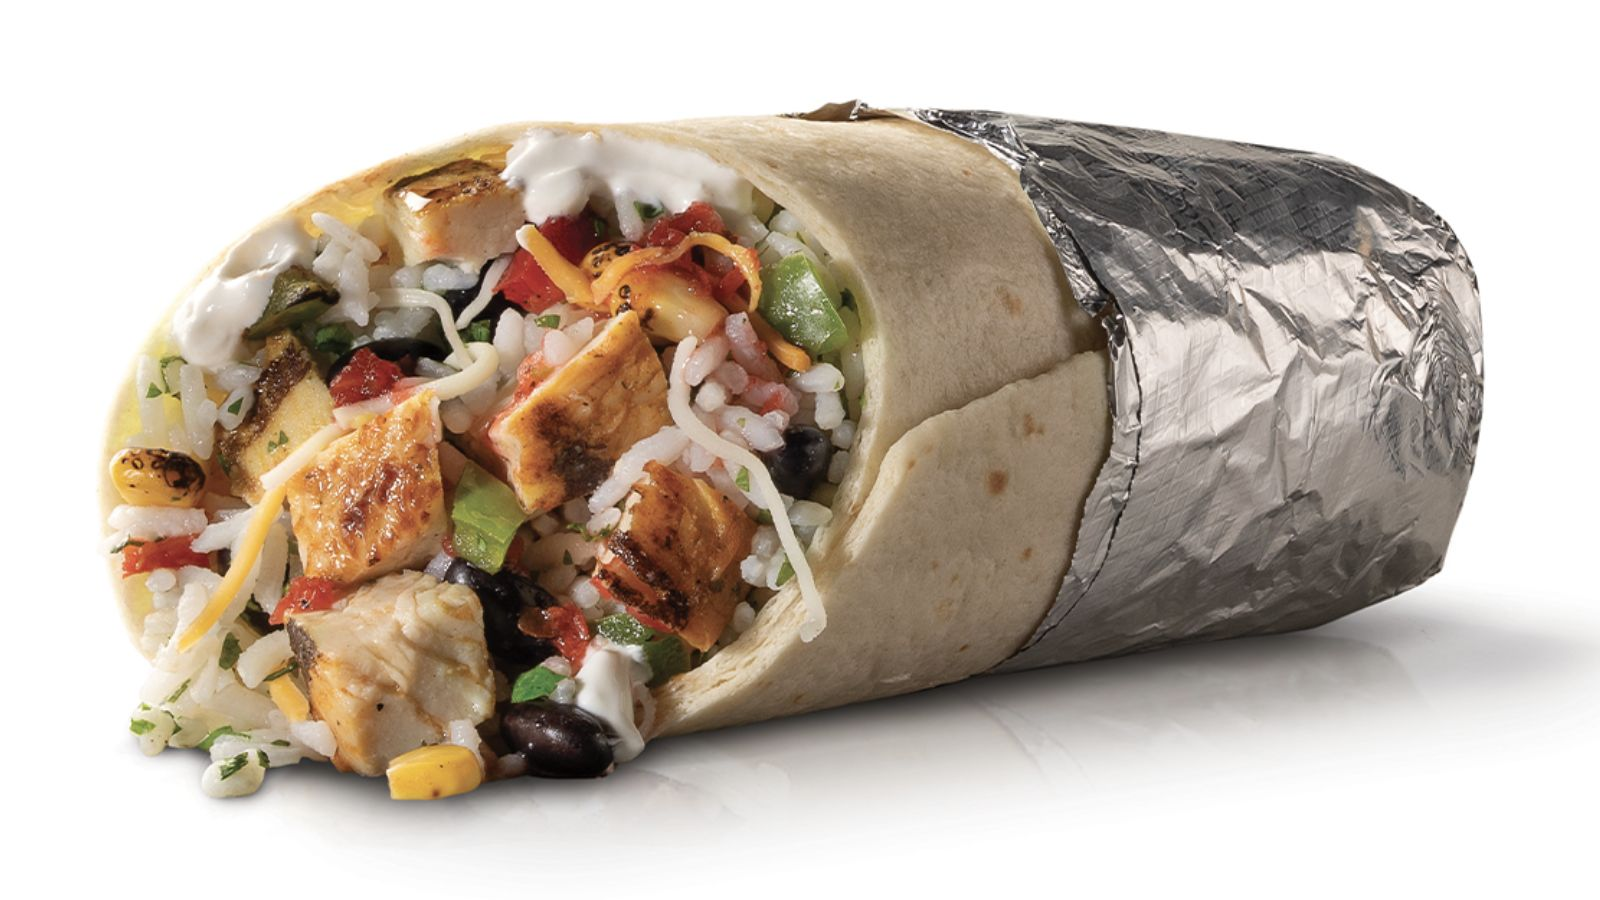 Celebrate National Burrito Day Like a Boss at Taco John's